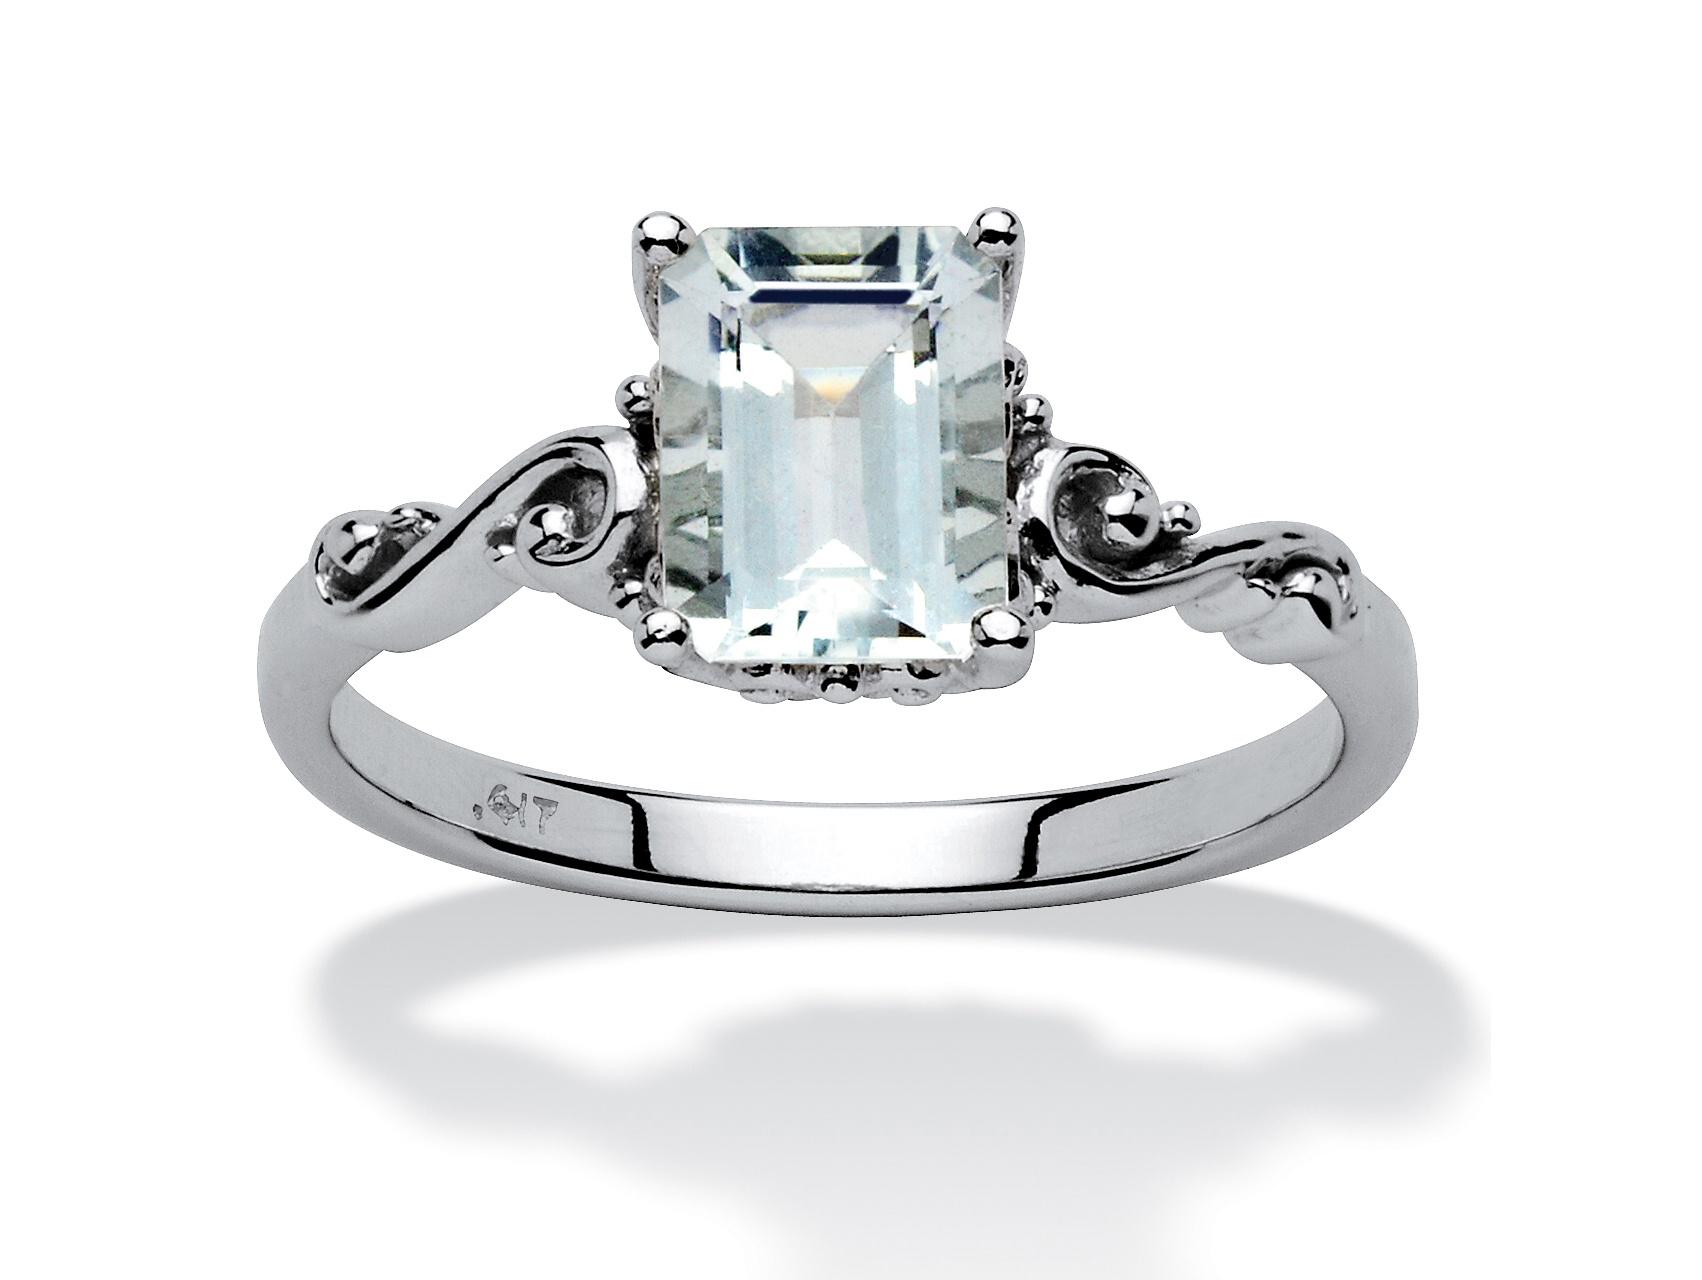 1.40 TCW Emerald-Cut Aquamarine Ring in 10k White Gold by PalmBeach Jewelry